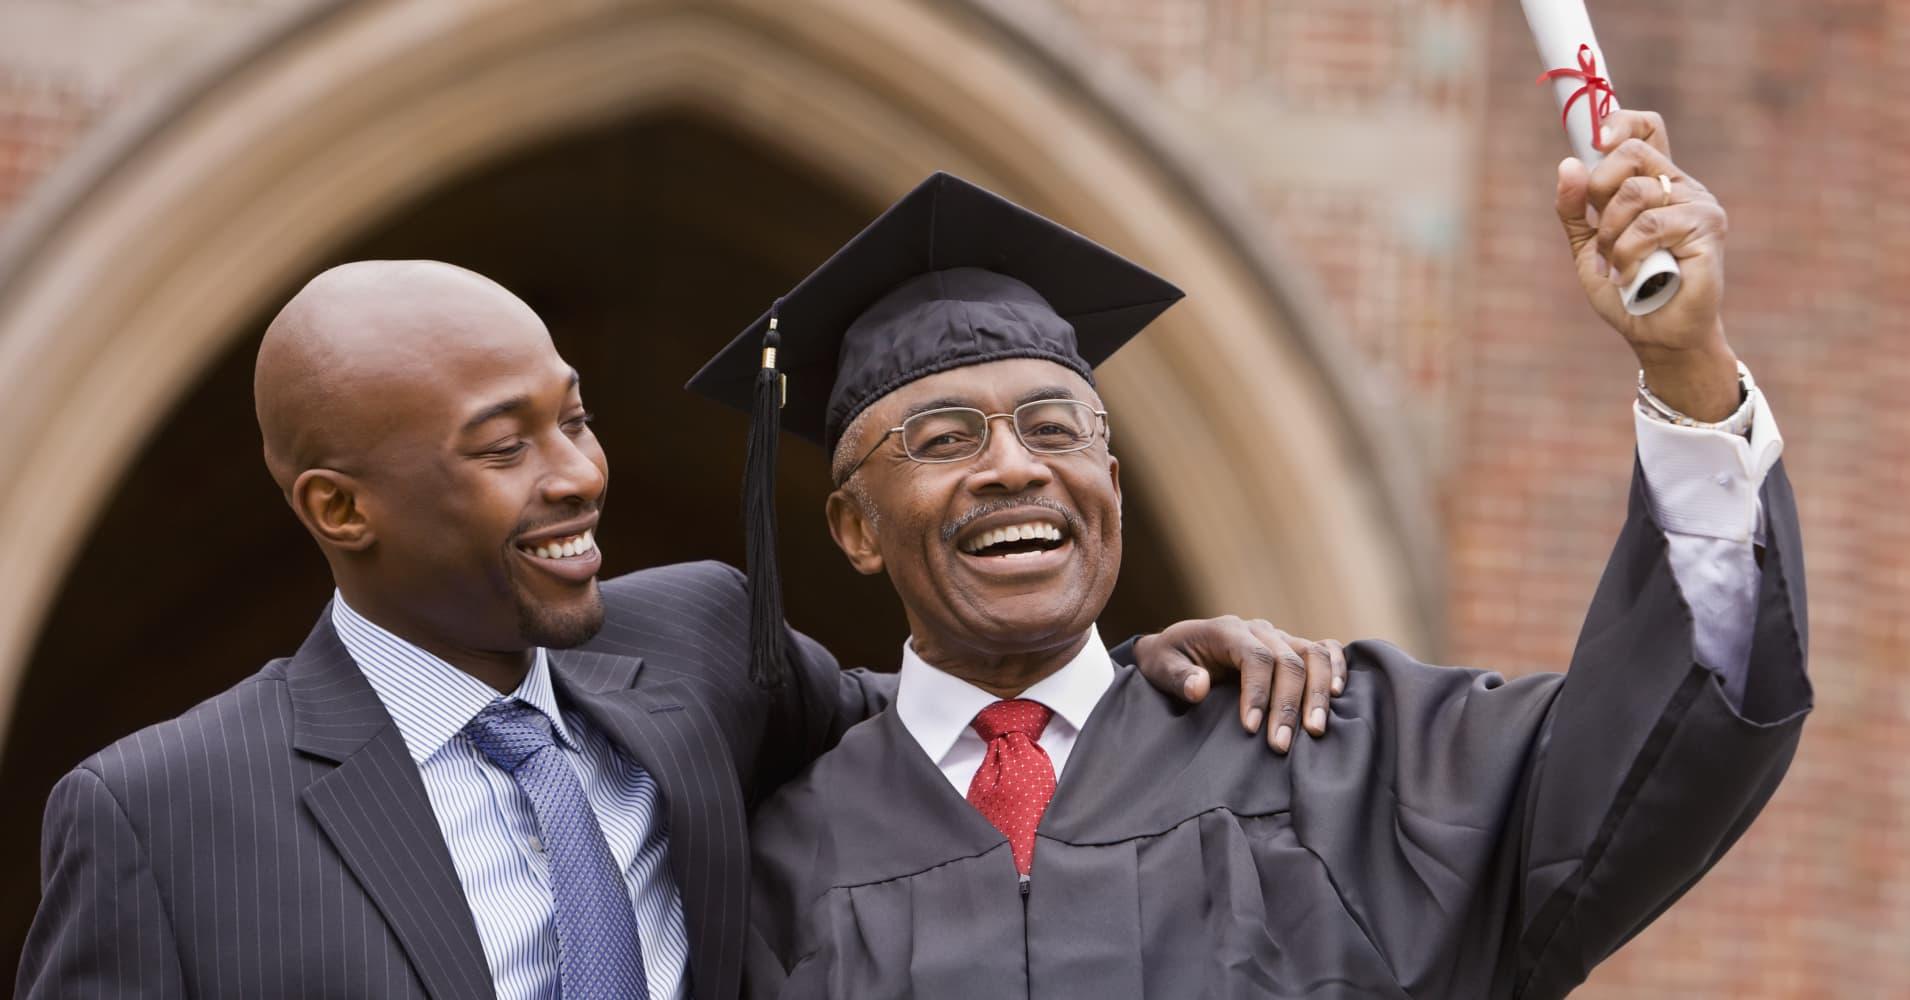 African man hugging graduate father